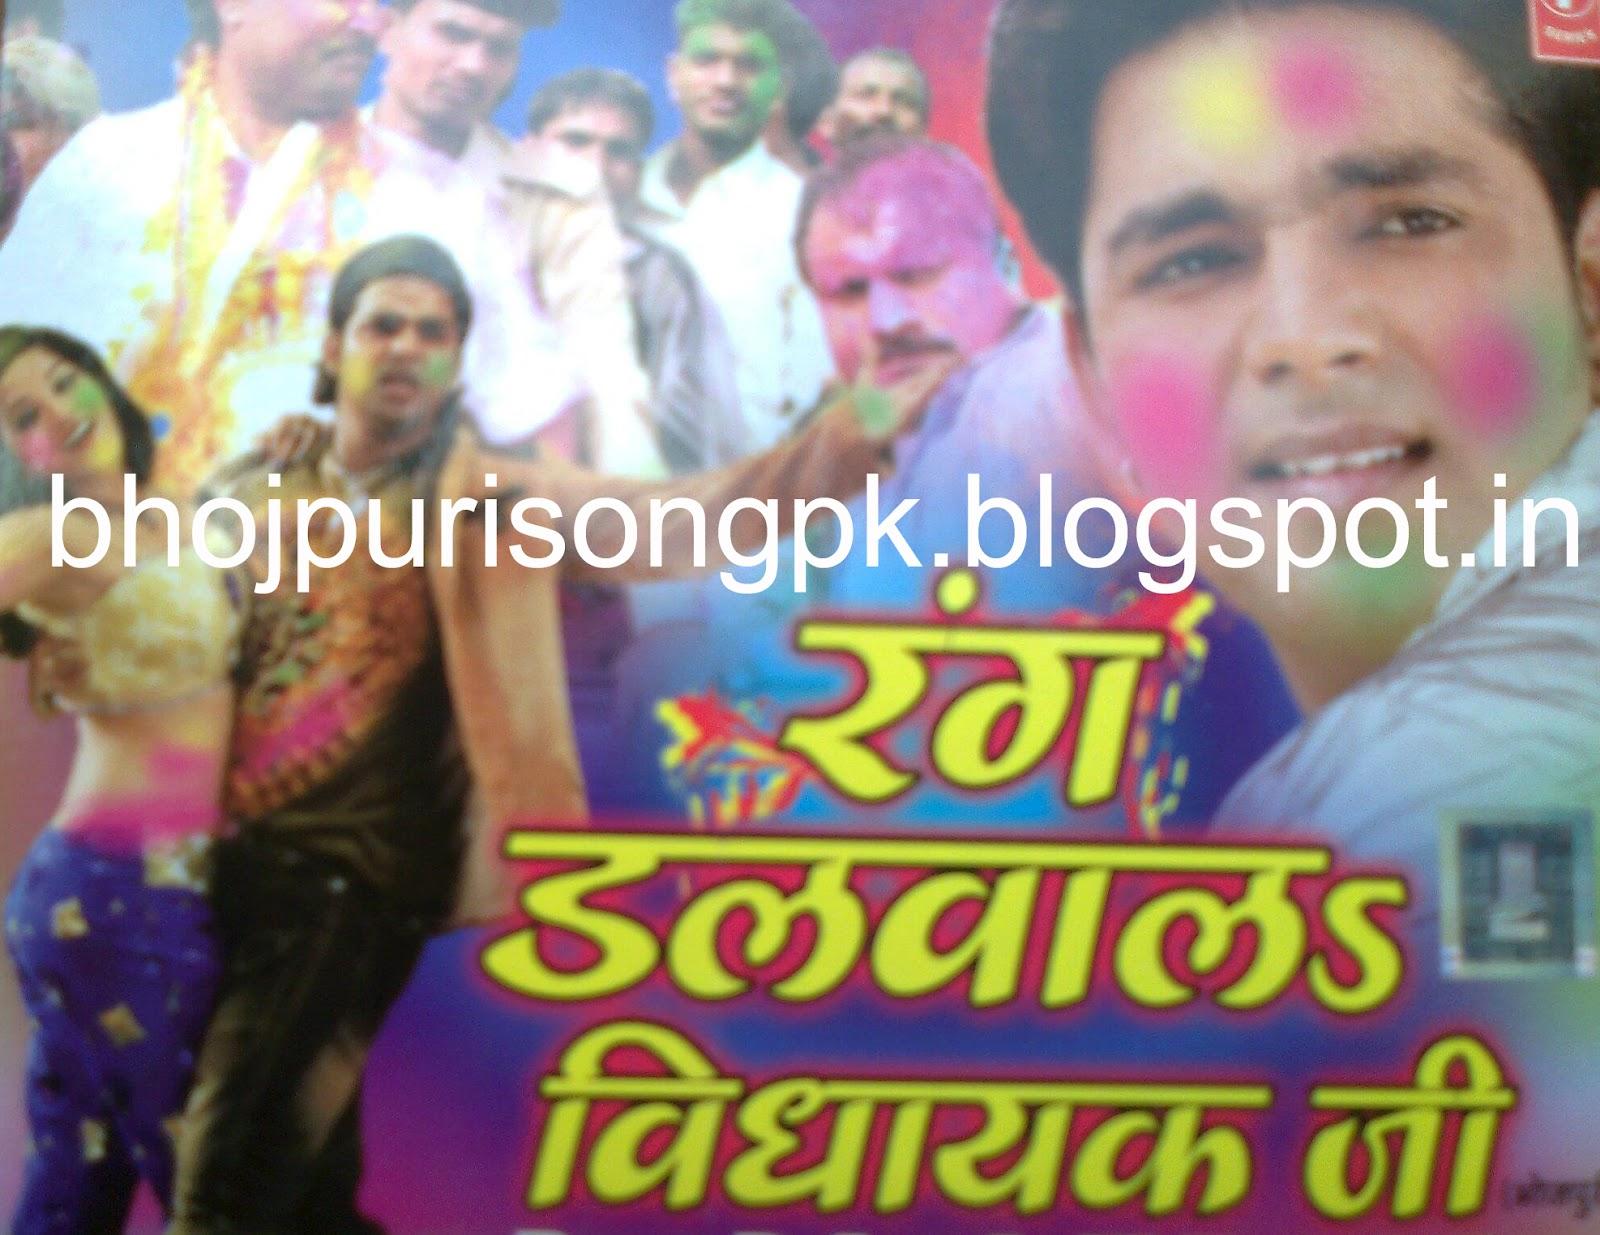 Mp3 songs downloads bhojpuri songs pk bhojpuri movie album songs